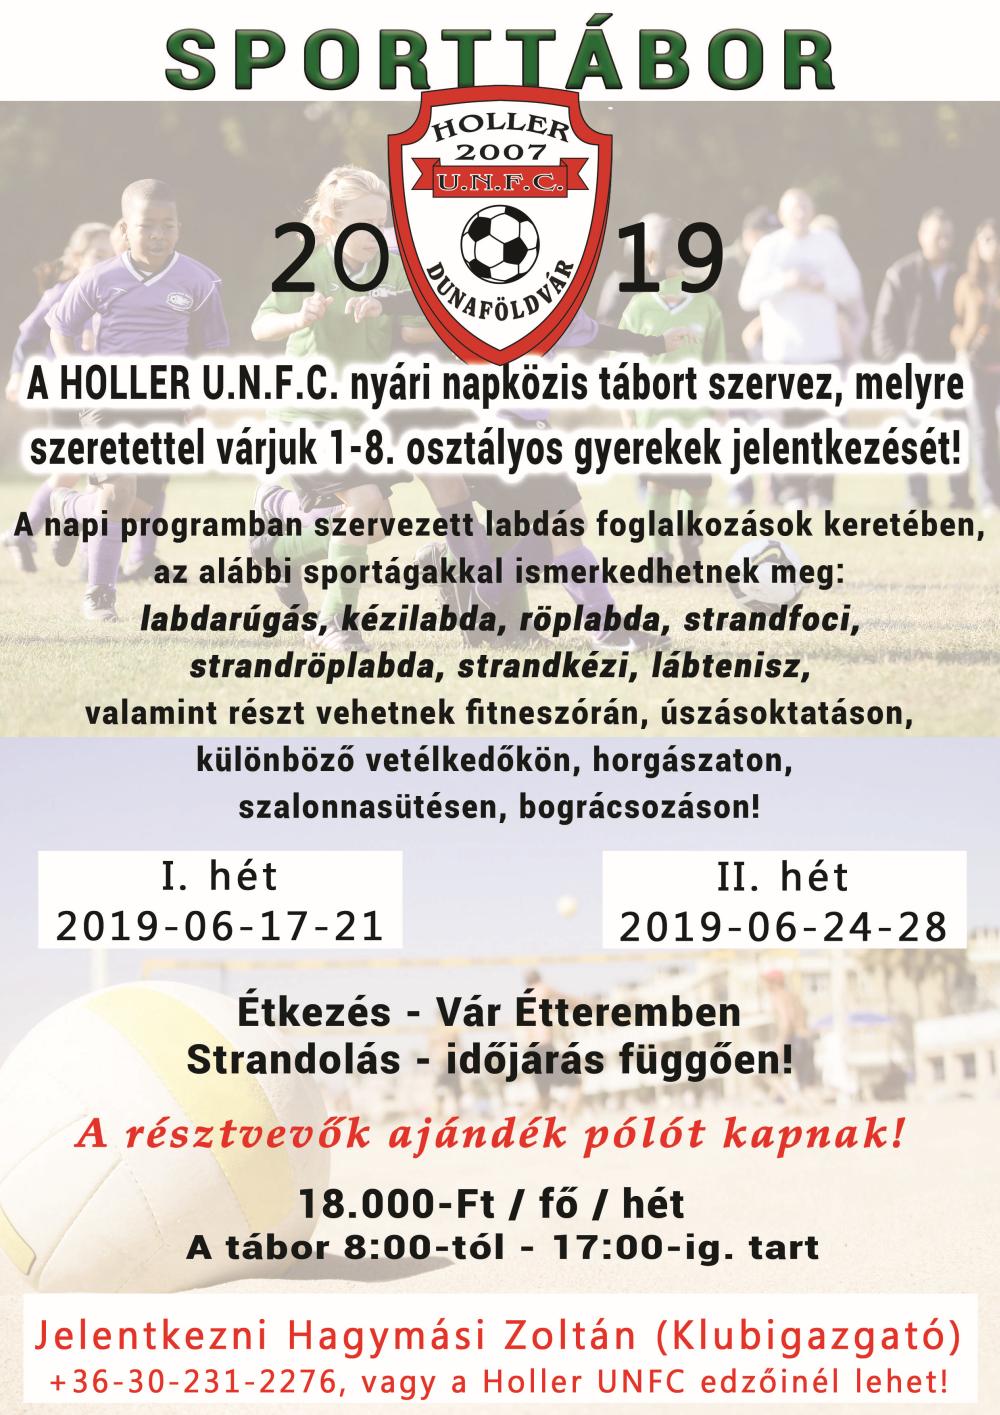 sporttabor_hollerufc.png